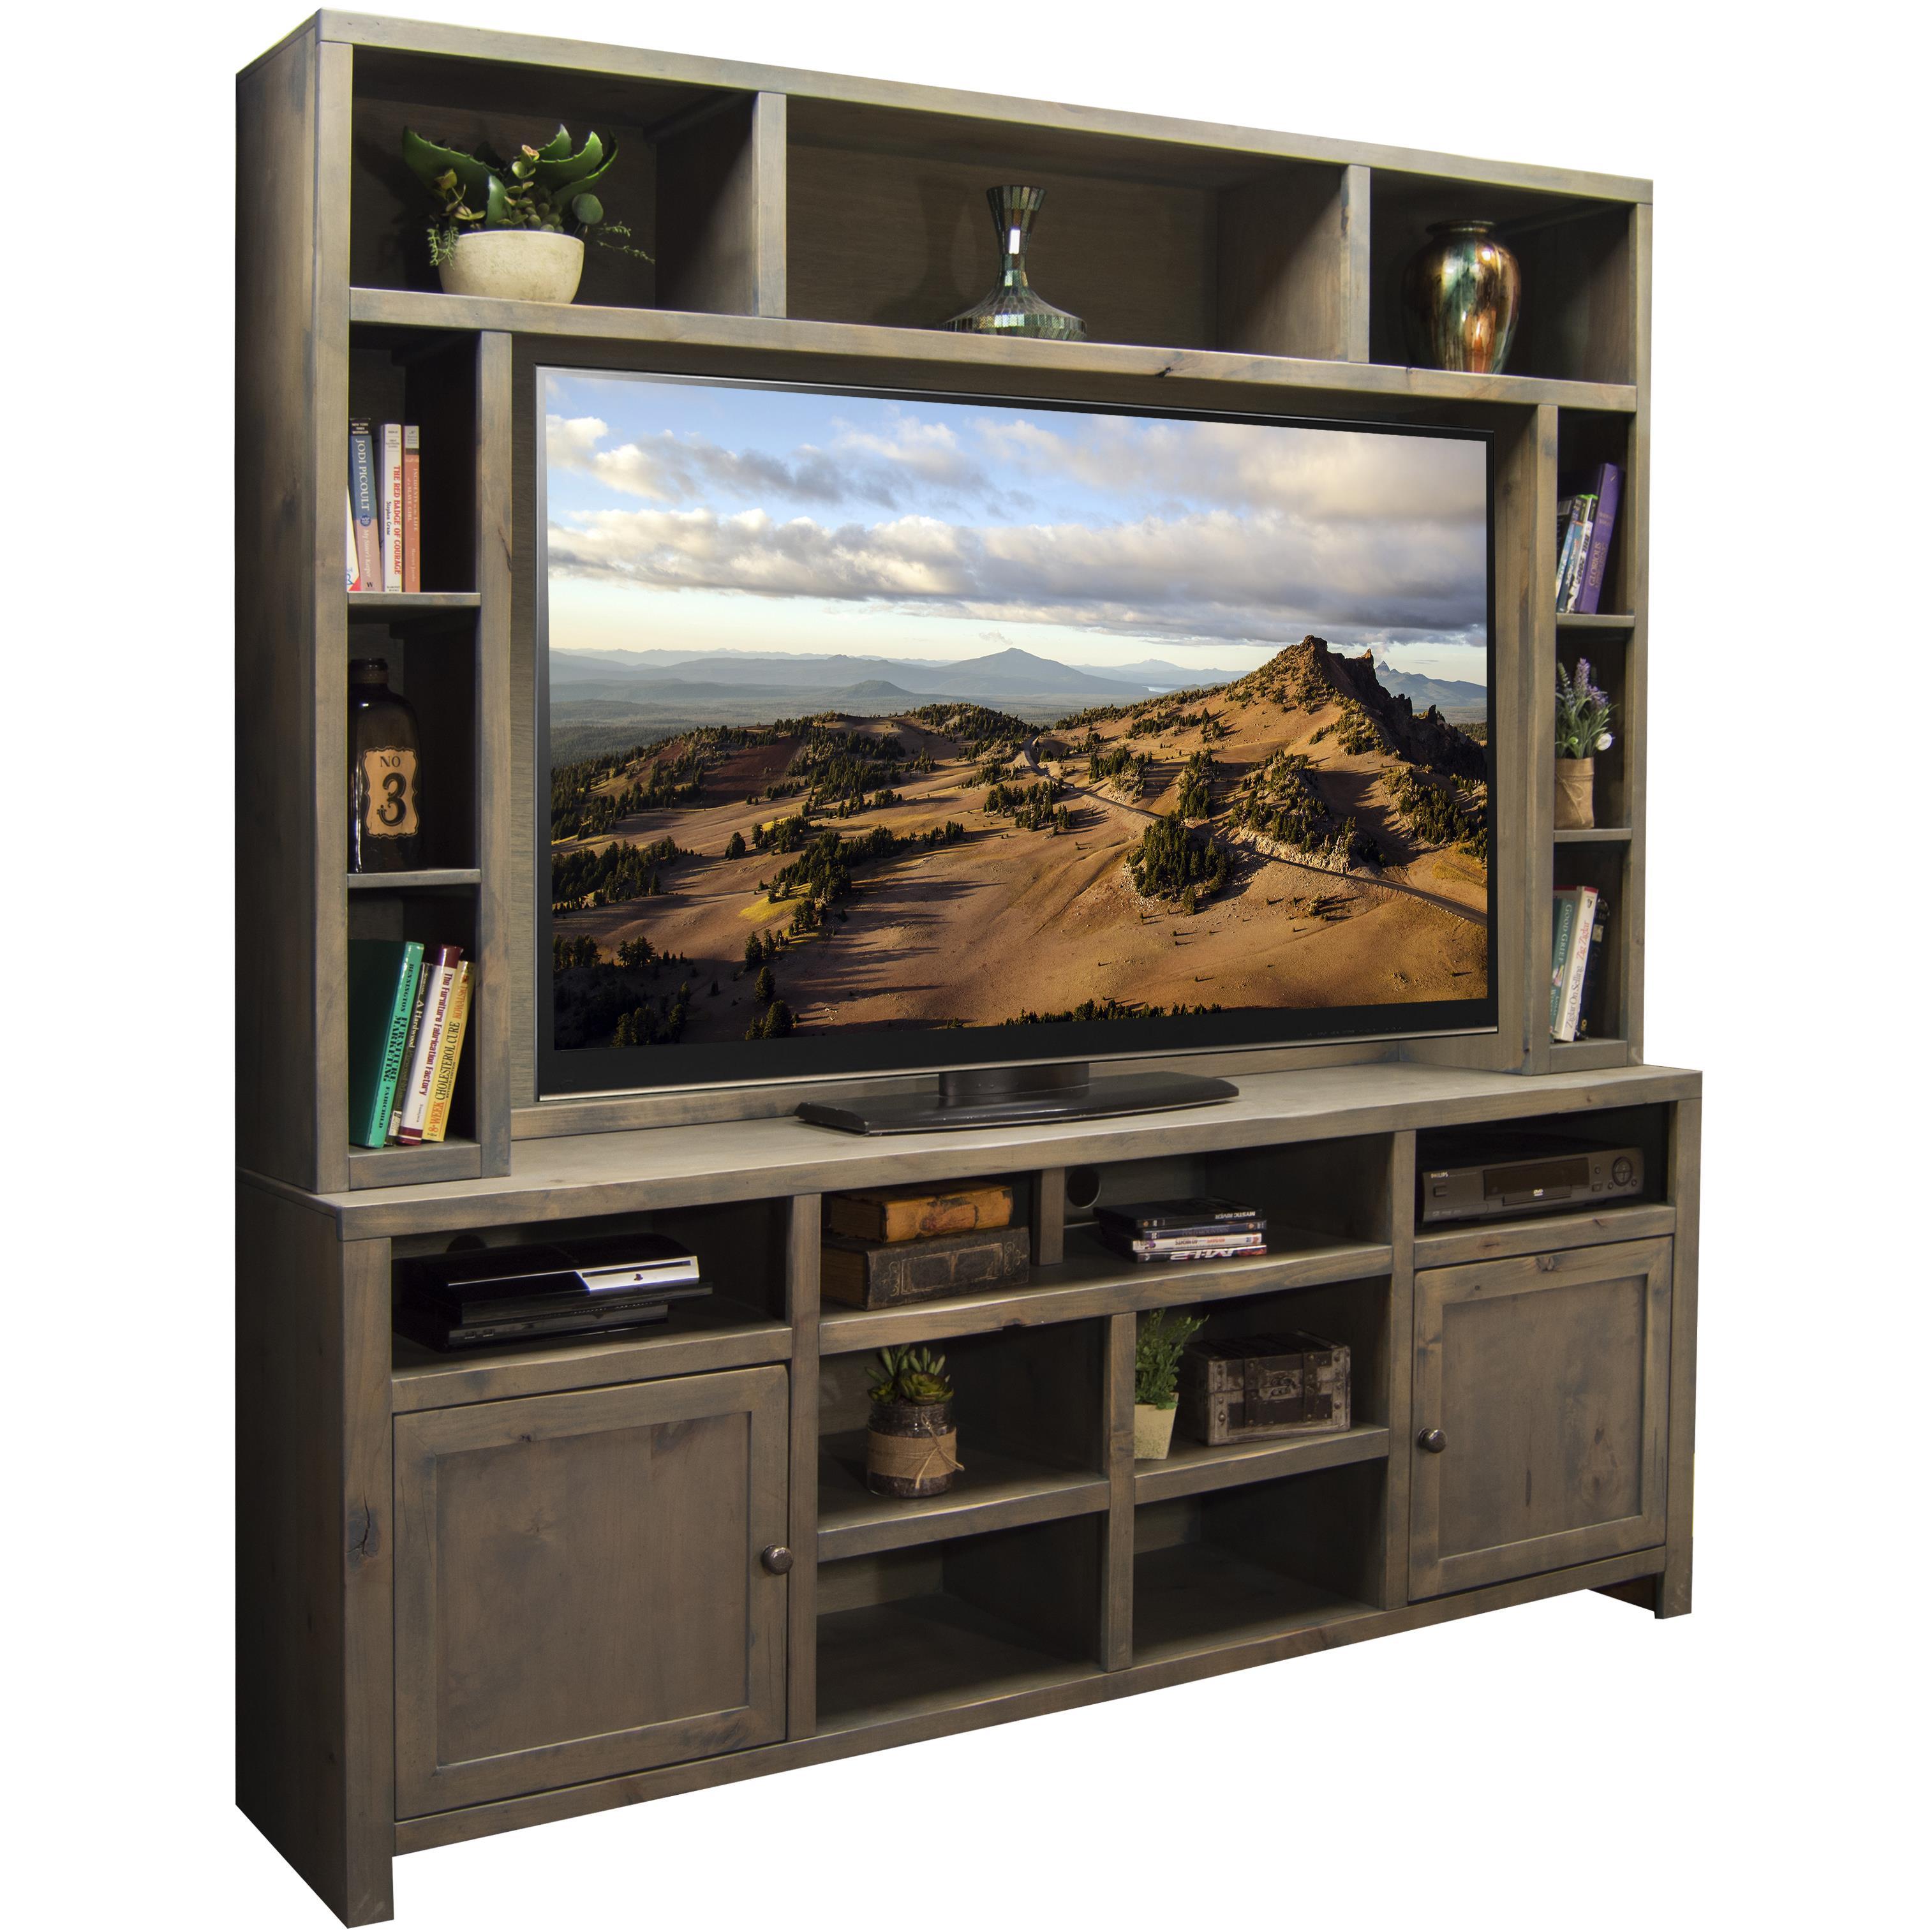 Superb Legends Furniture Joshua Creek Entertainment Unit With 2 Doors And 17  Shelves | Dunk U0026 Bright Furniture | Wall Unit